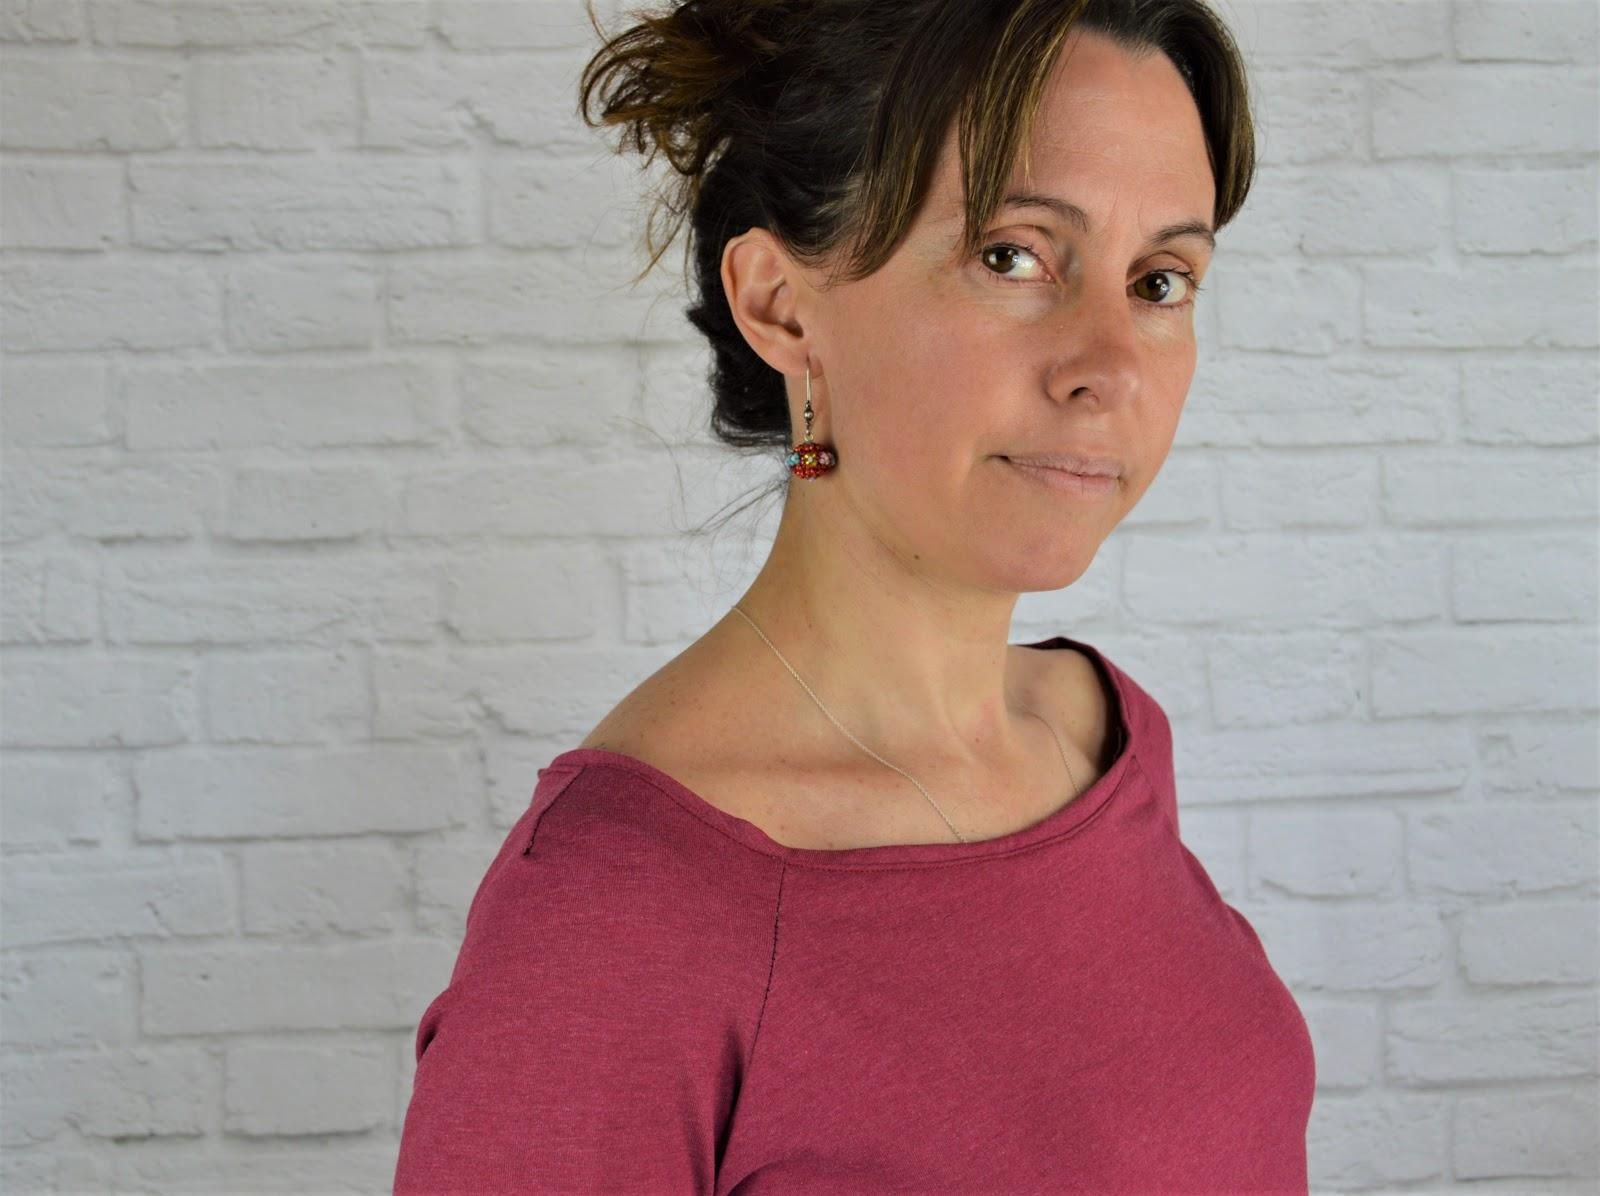 Camiseta printed lace ottobre design para mujer